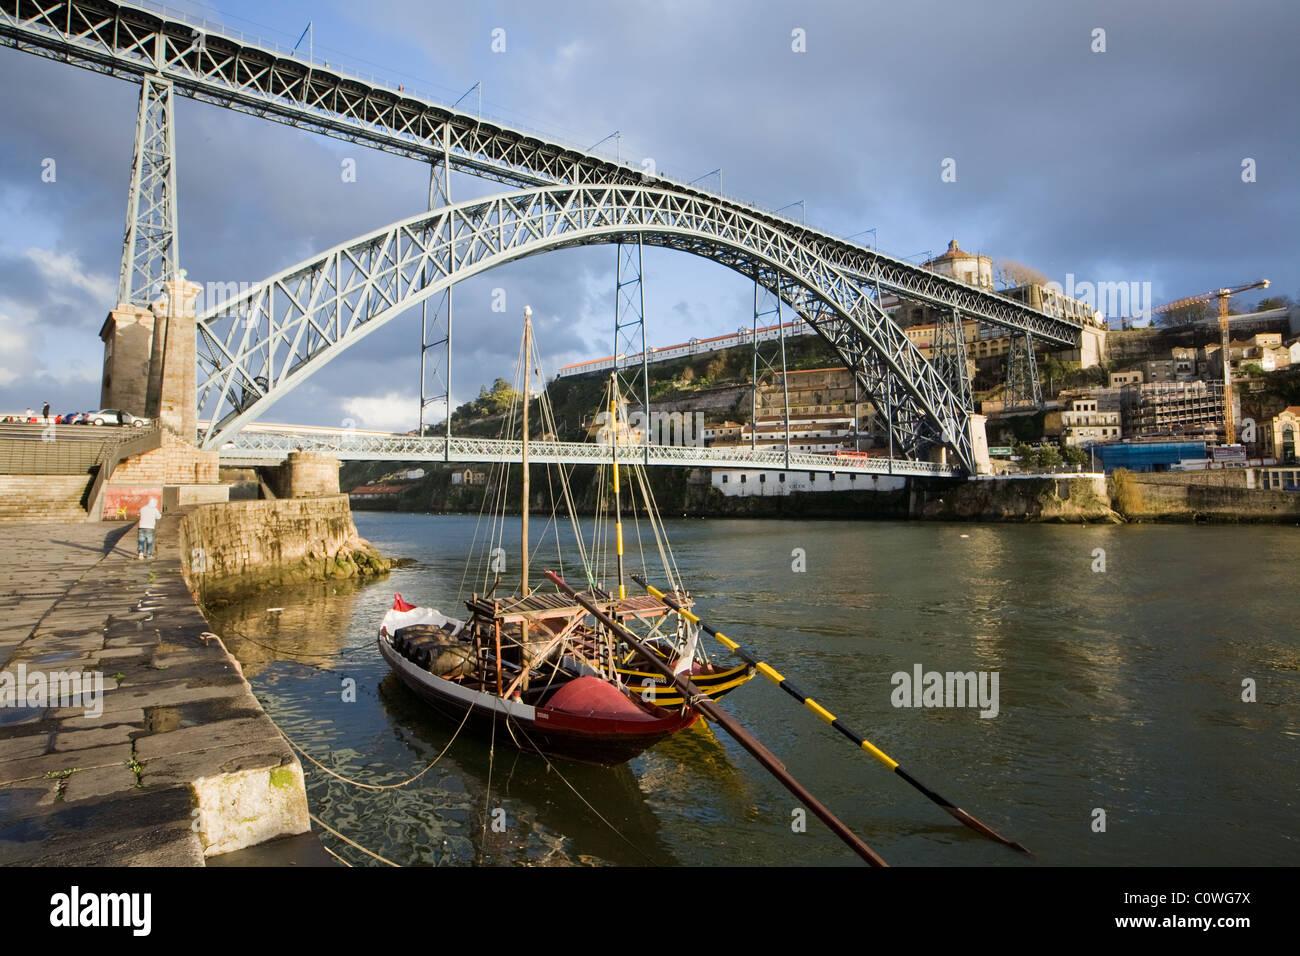 Douro River and Luis I Bridge, Oporto, Lisbon - Stock Image